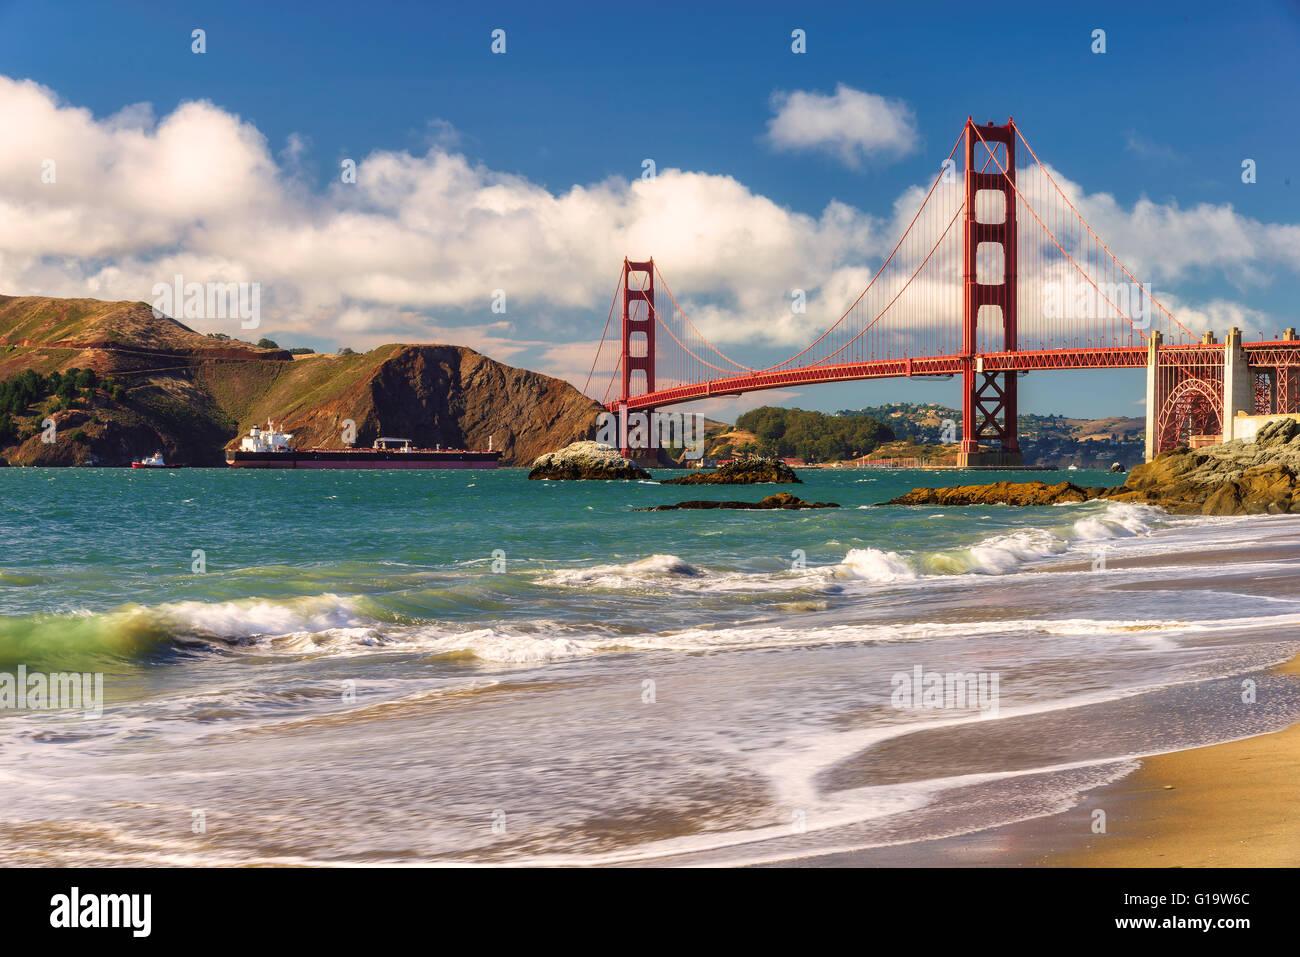 Golden Gate Bridge from Marshall Beach, San Francisco - Stock Image